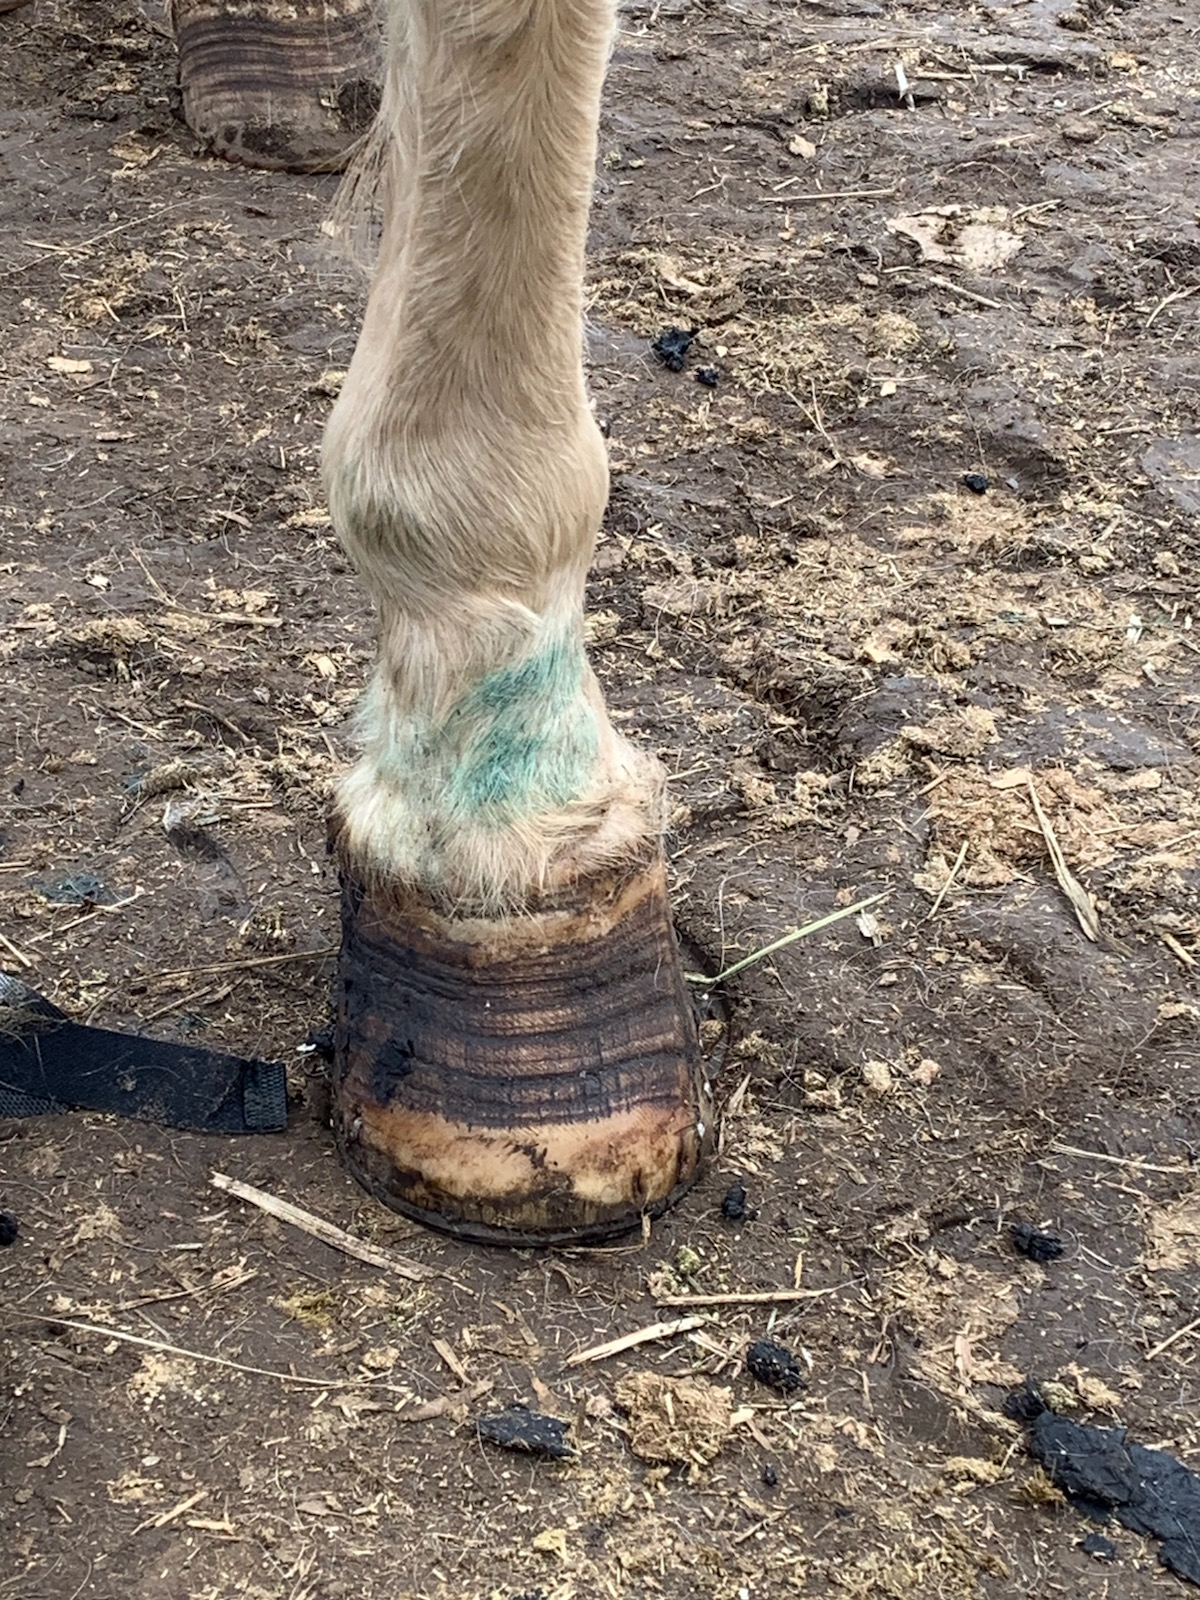 Ani laminitis feet